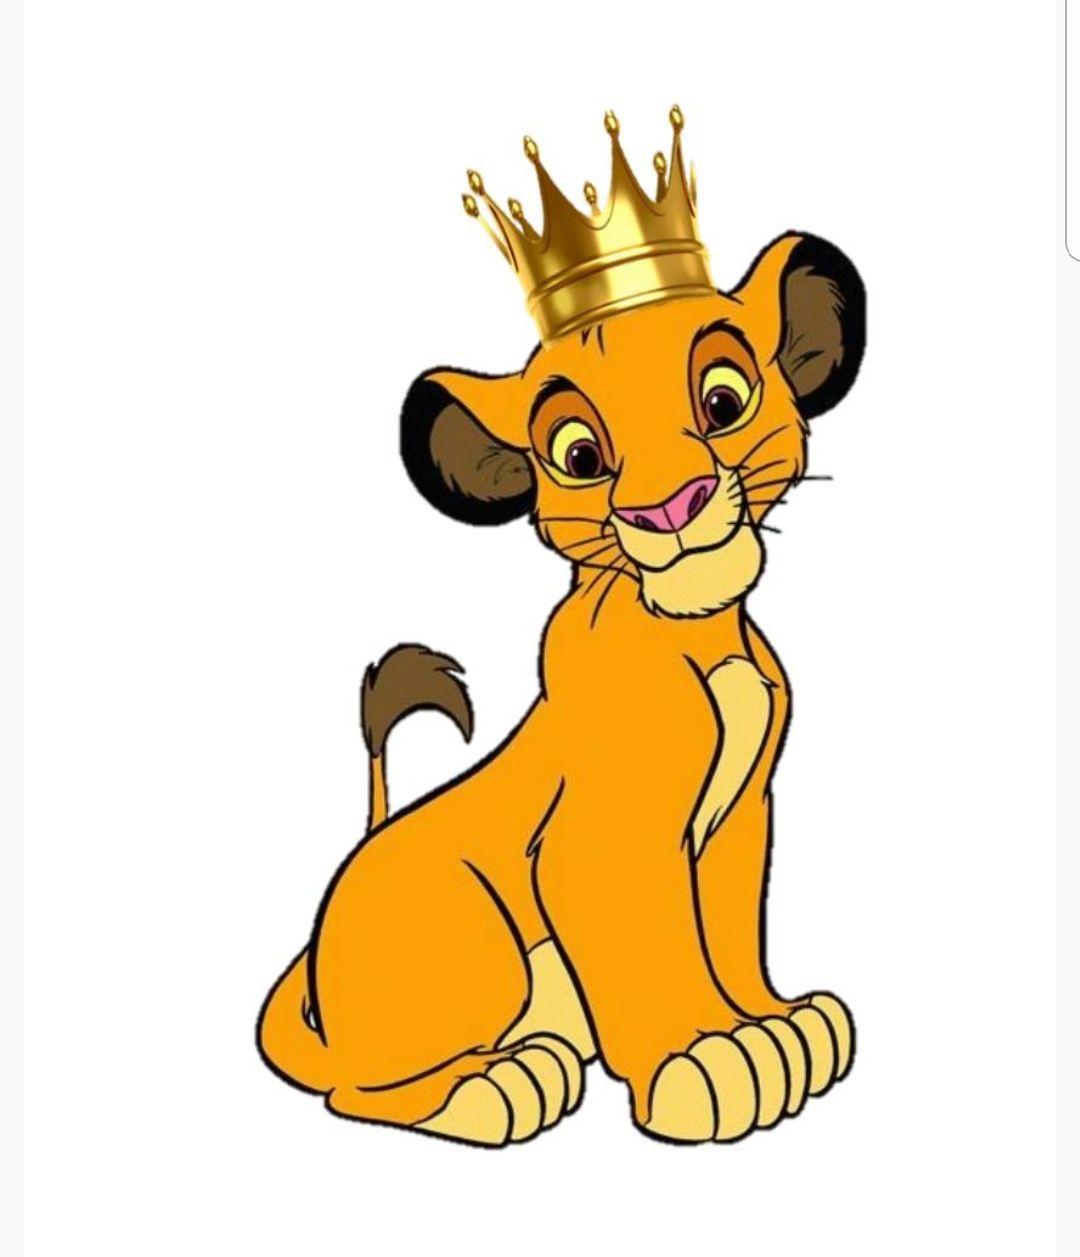 Simba Rey Lion King Birthday Lion King Pictures Lion King Theme Cartoon lion wearing a crown premium vector. simba rey lion king birthday lion